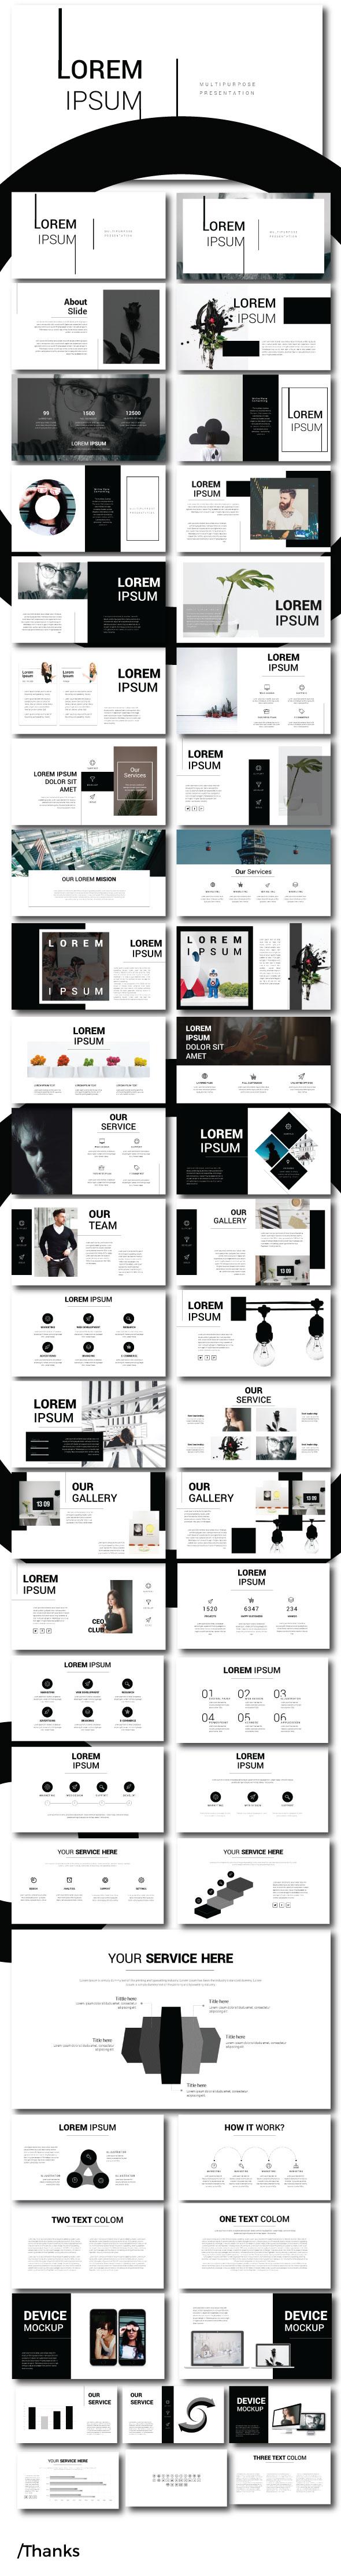 Lorem Ipsum - Google Slide - Google Slides Presentation Templates